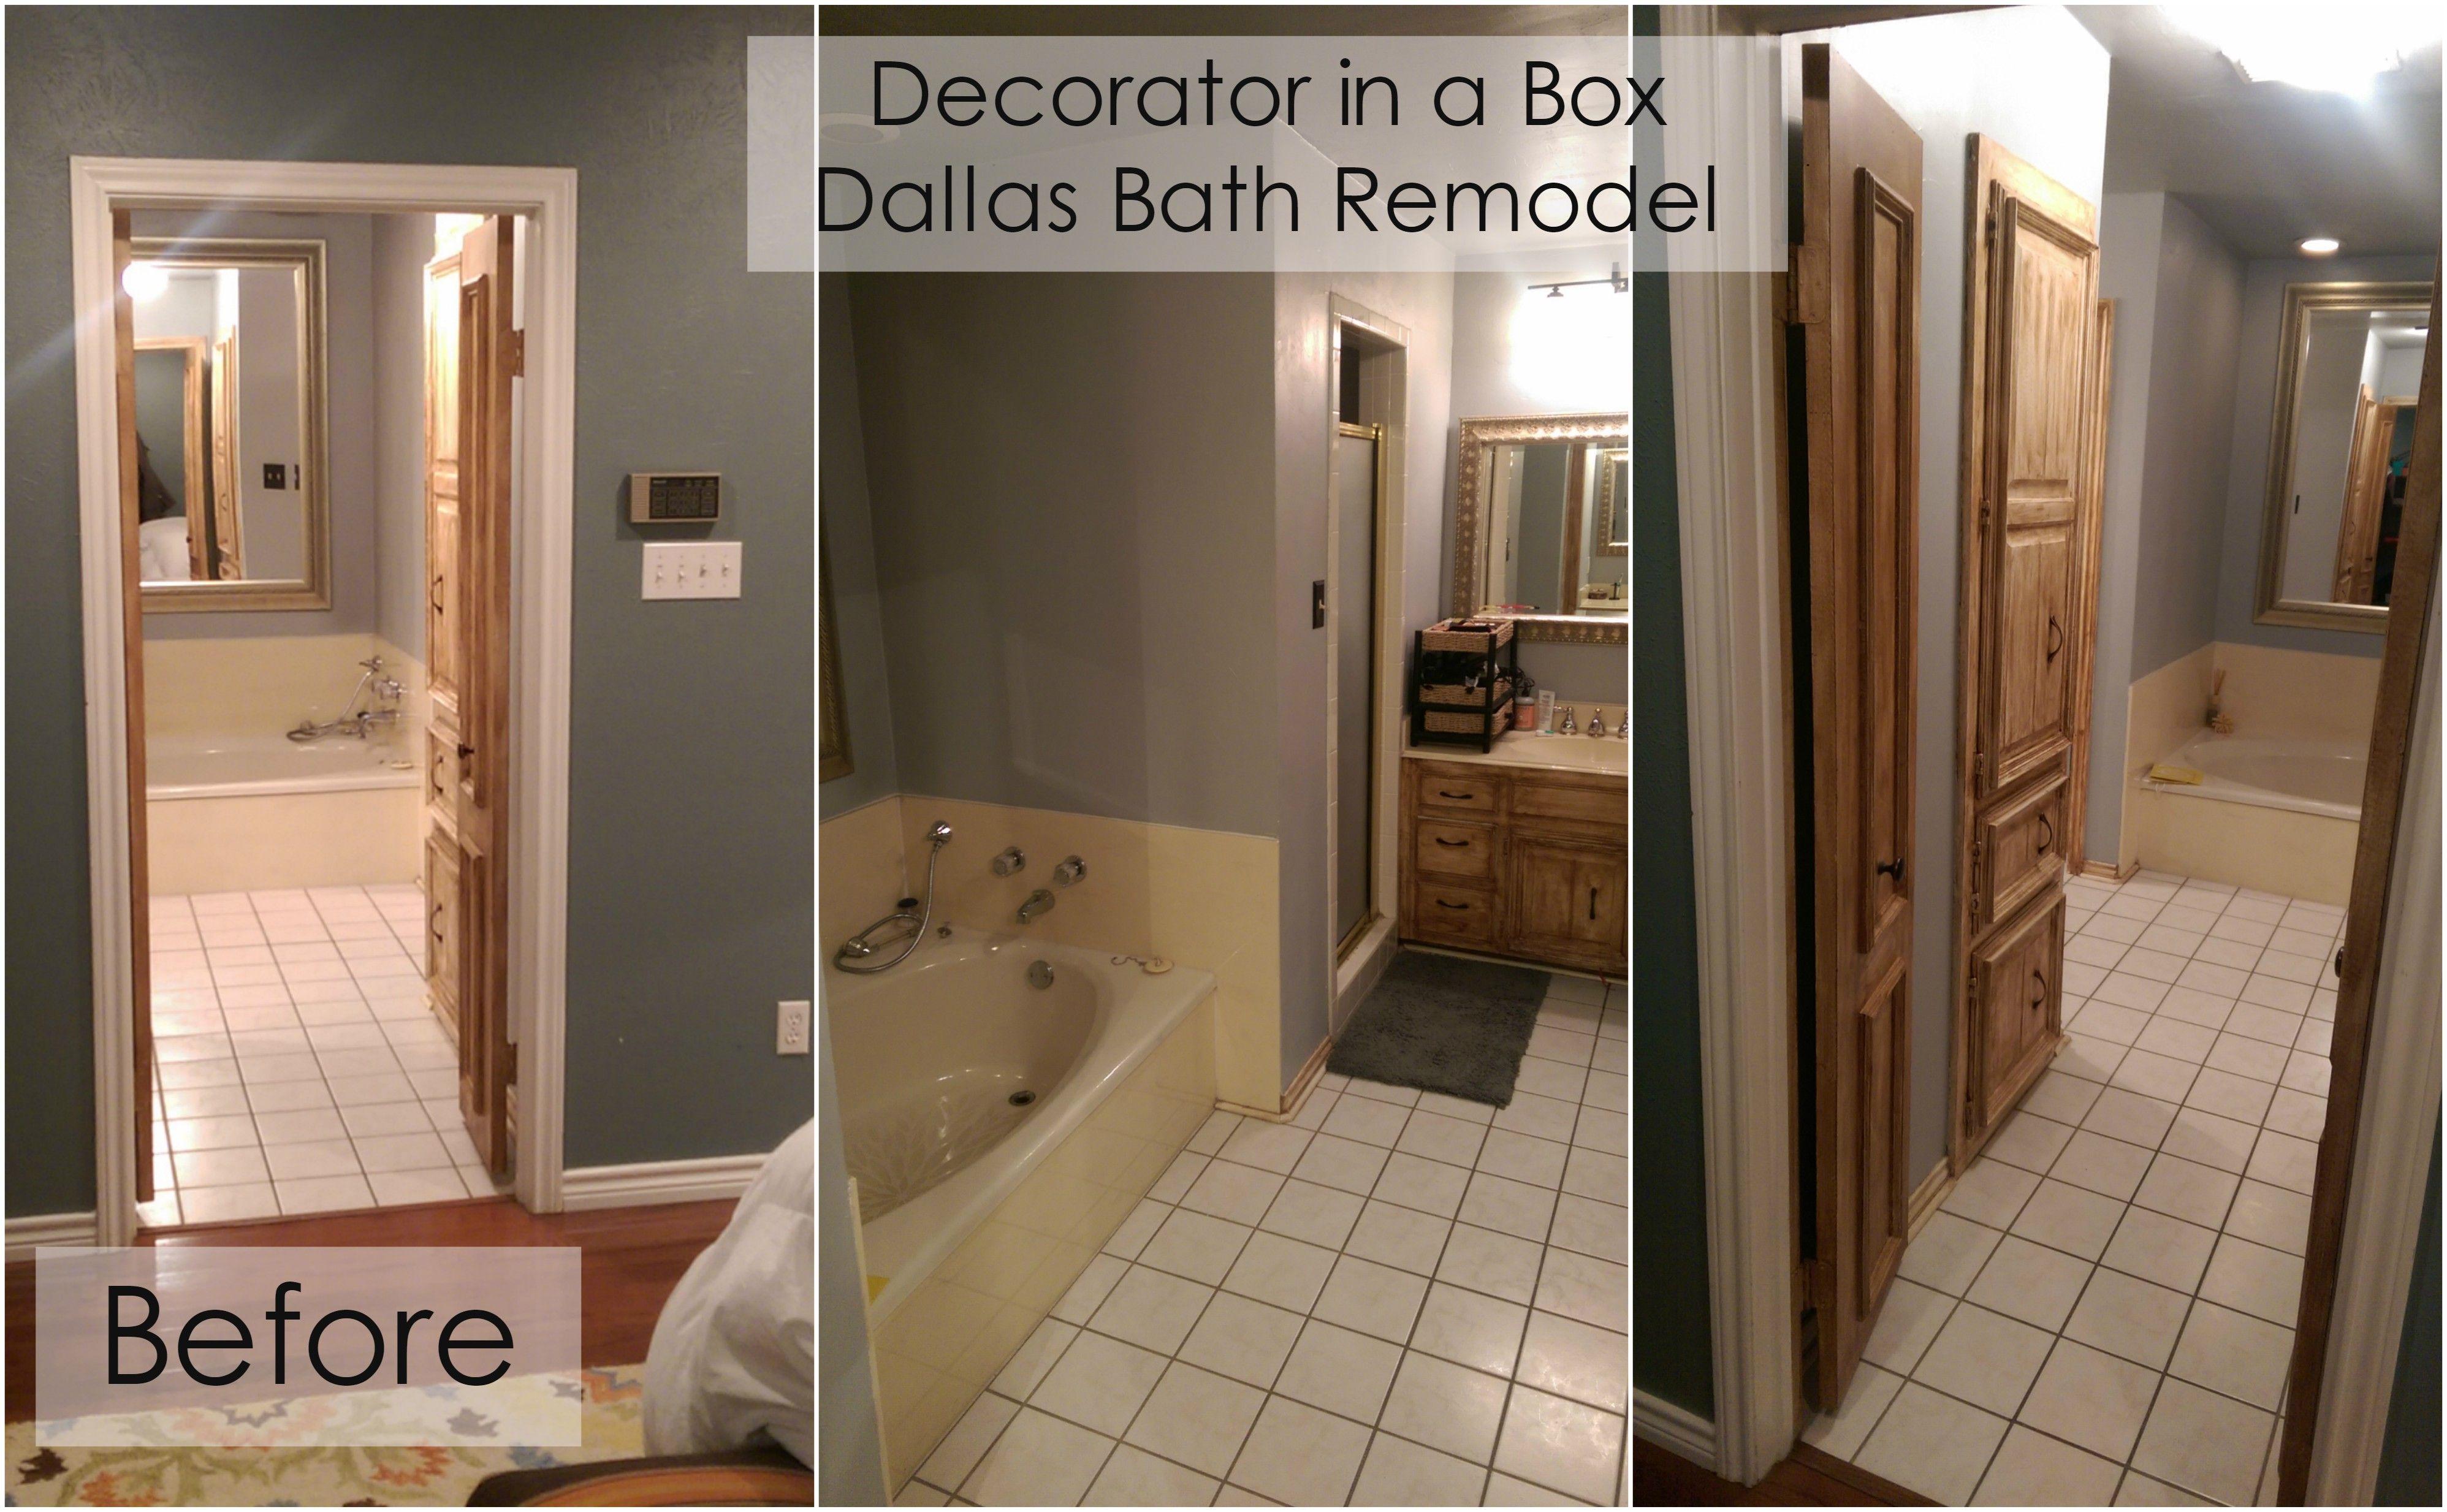 Dallas Bath Remodel Before U0026 After::